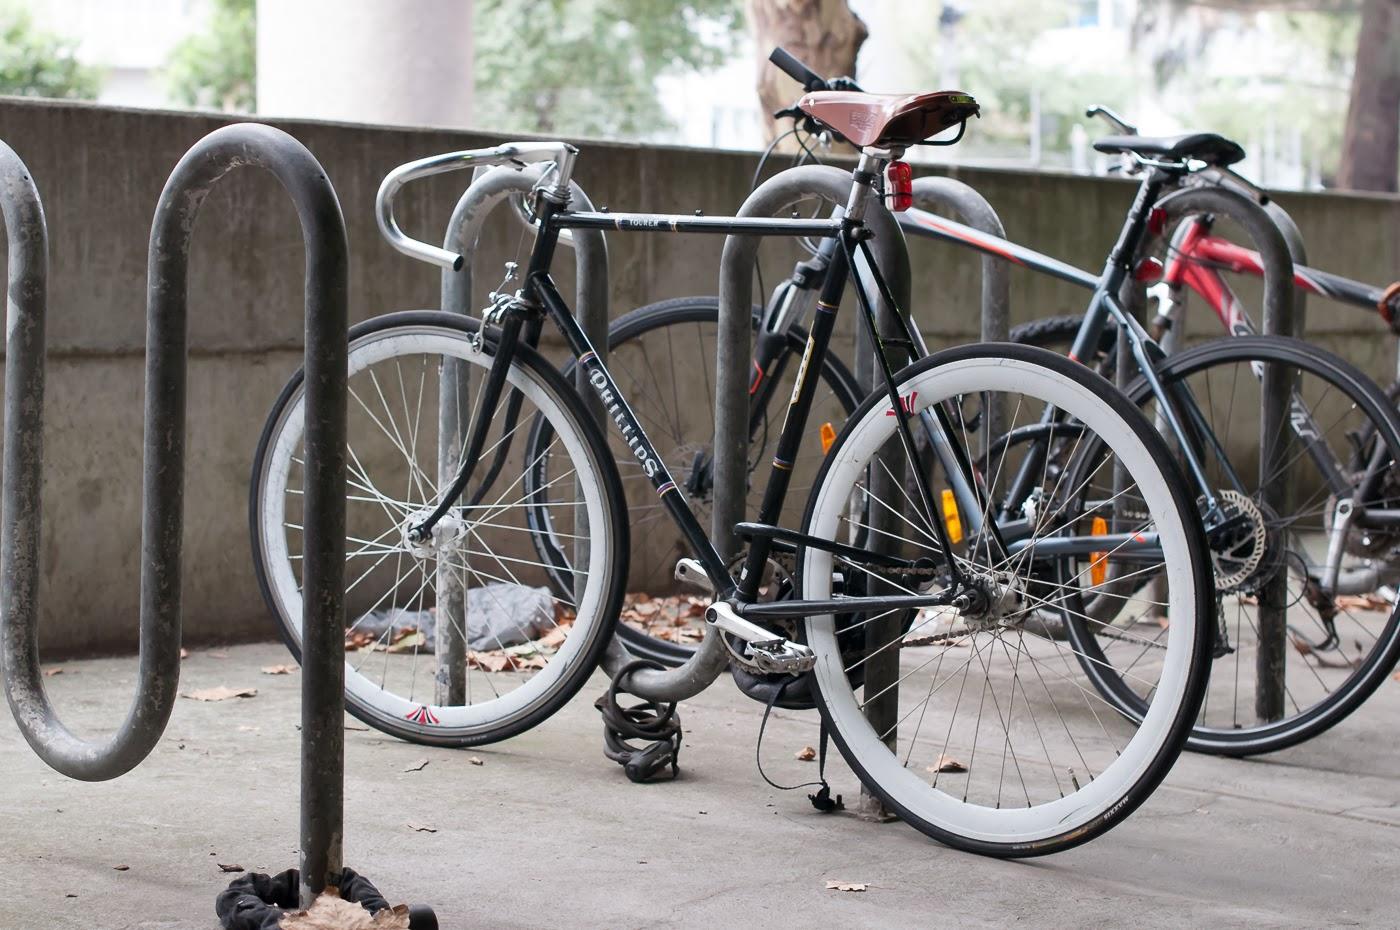 single speed, bike, bicycle, tim macauley, the biketorialist, melbourne, road bike, conversion,  custom, phillips, vintage, frame